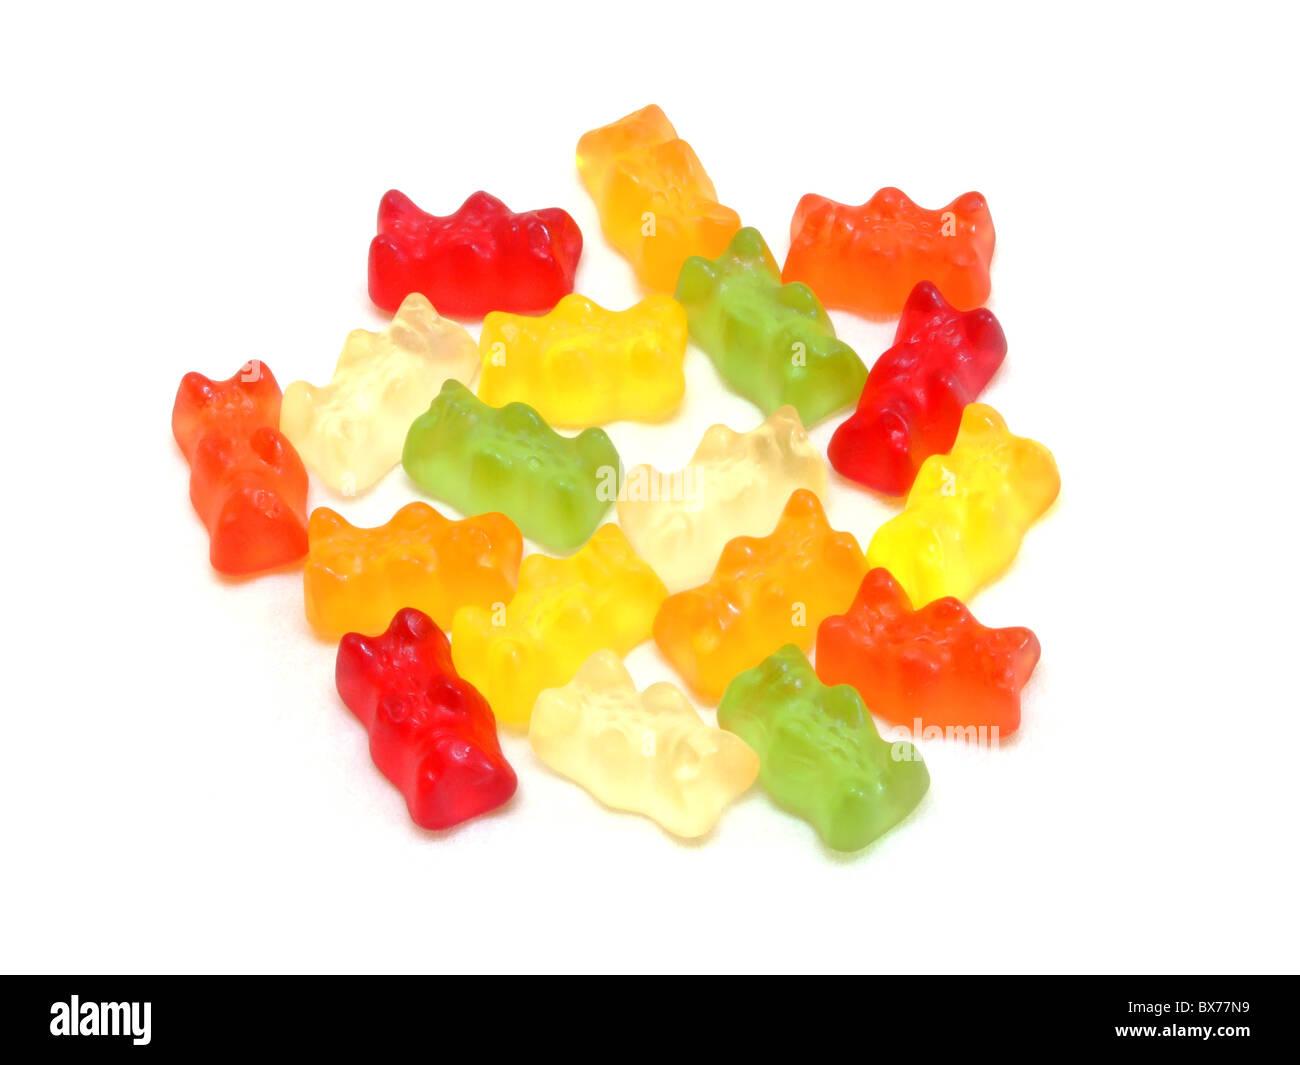 Gummibärchen / Gummy bears - Stock Image